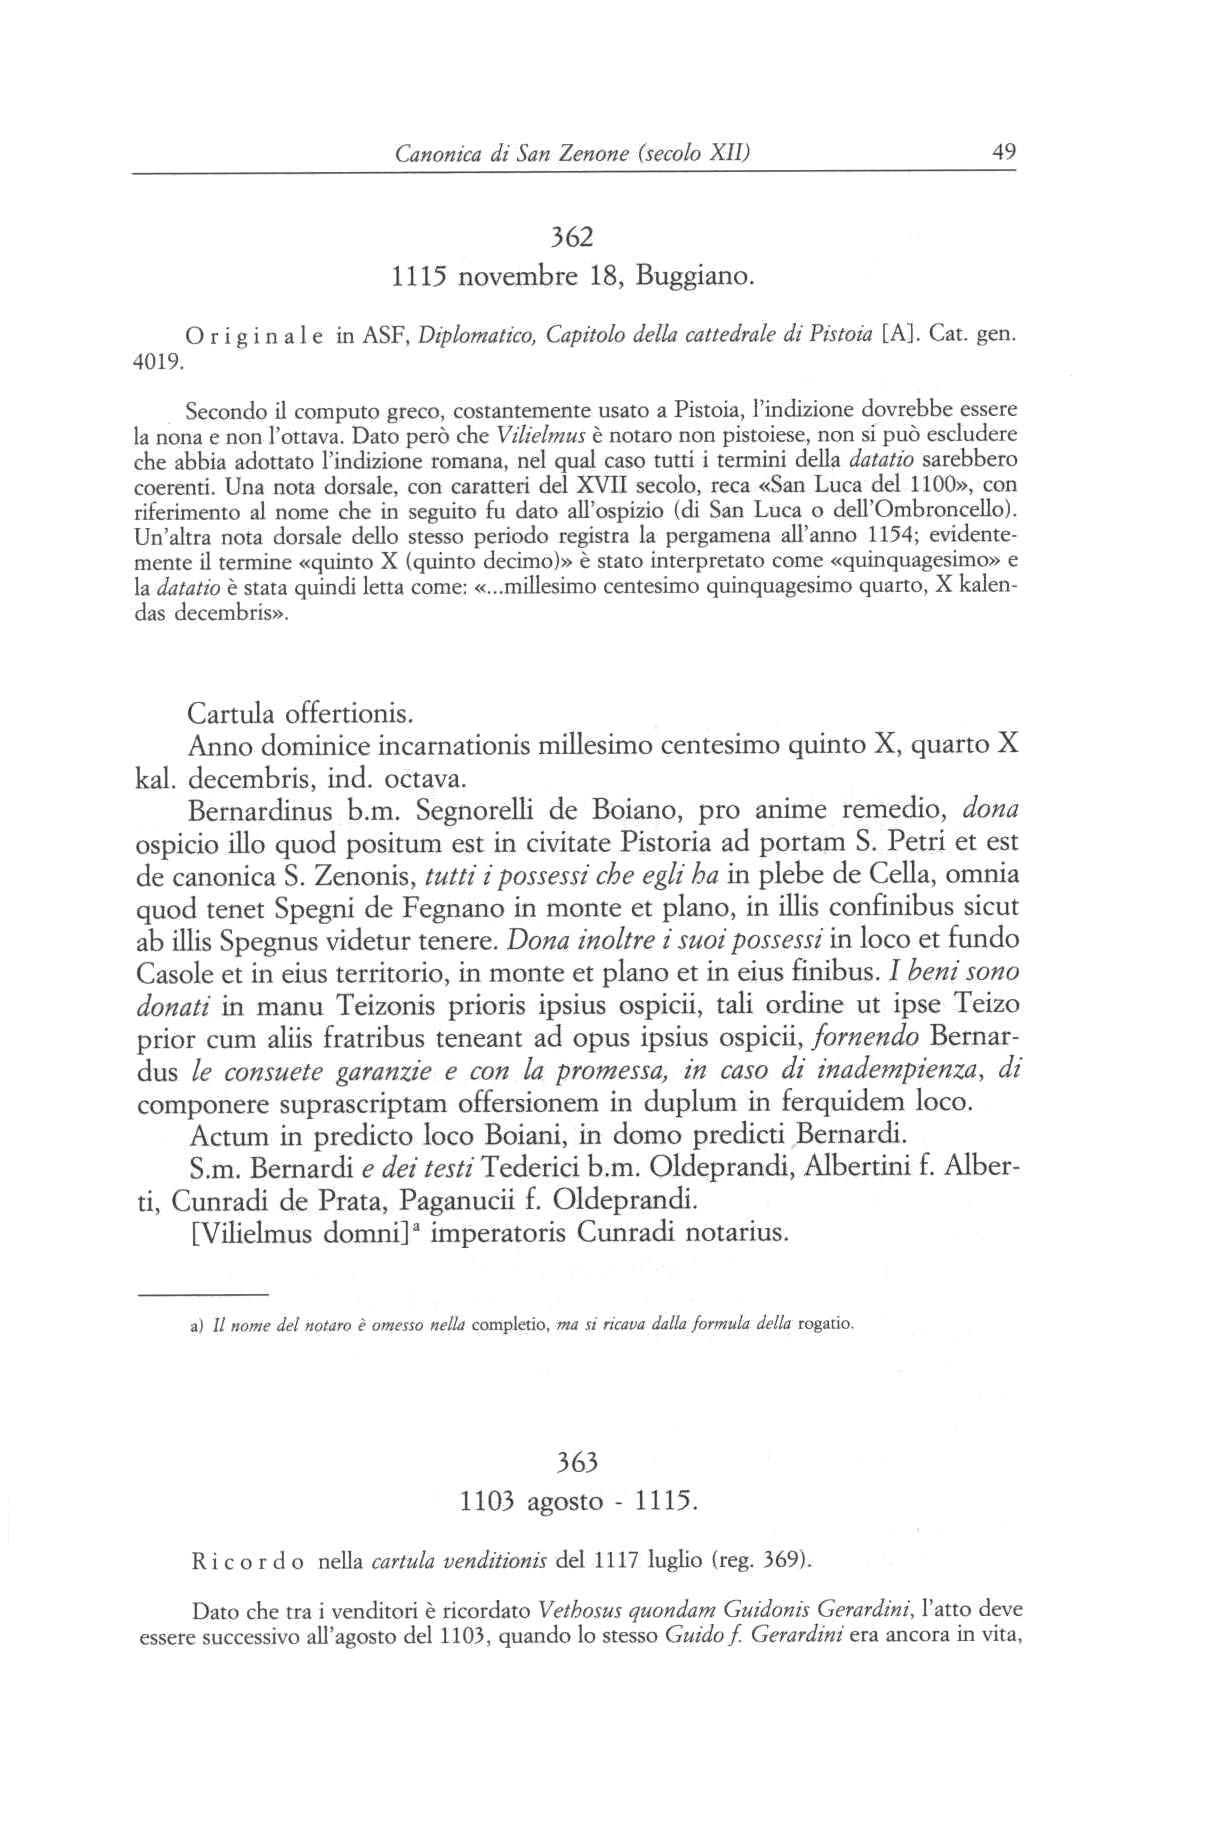 Canonica S. Zenone XII 0049.jpg